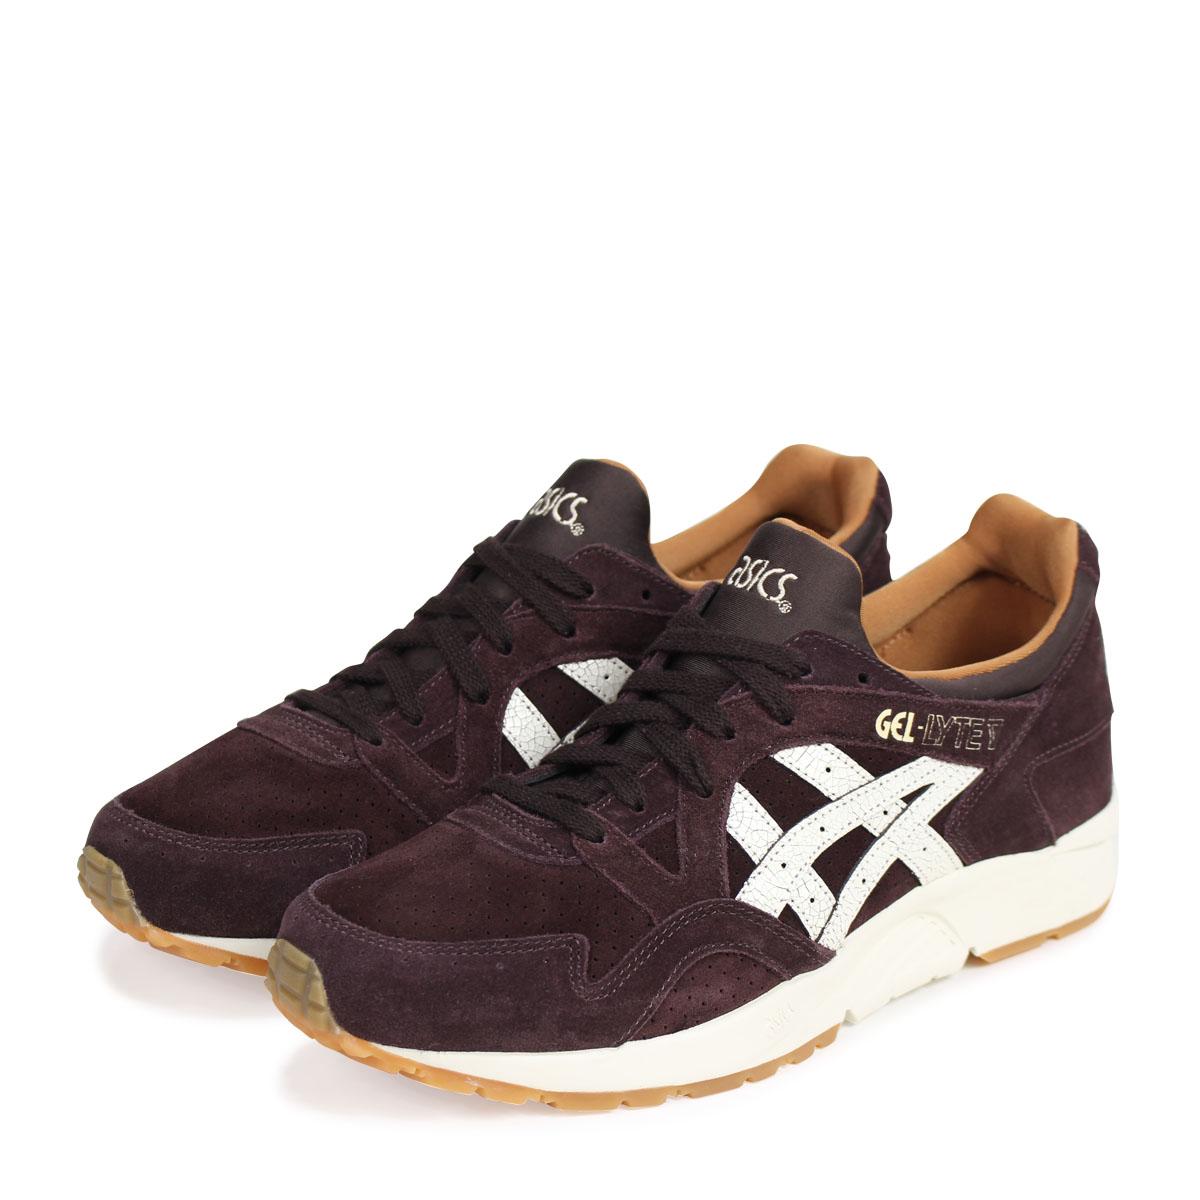 asics Tiger GEL LYTE V ASICS tiger gel light 5 sneakers H8E4L 2900 men brown [load planned Shinnyu load in reservation product 320 containing] [183]